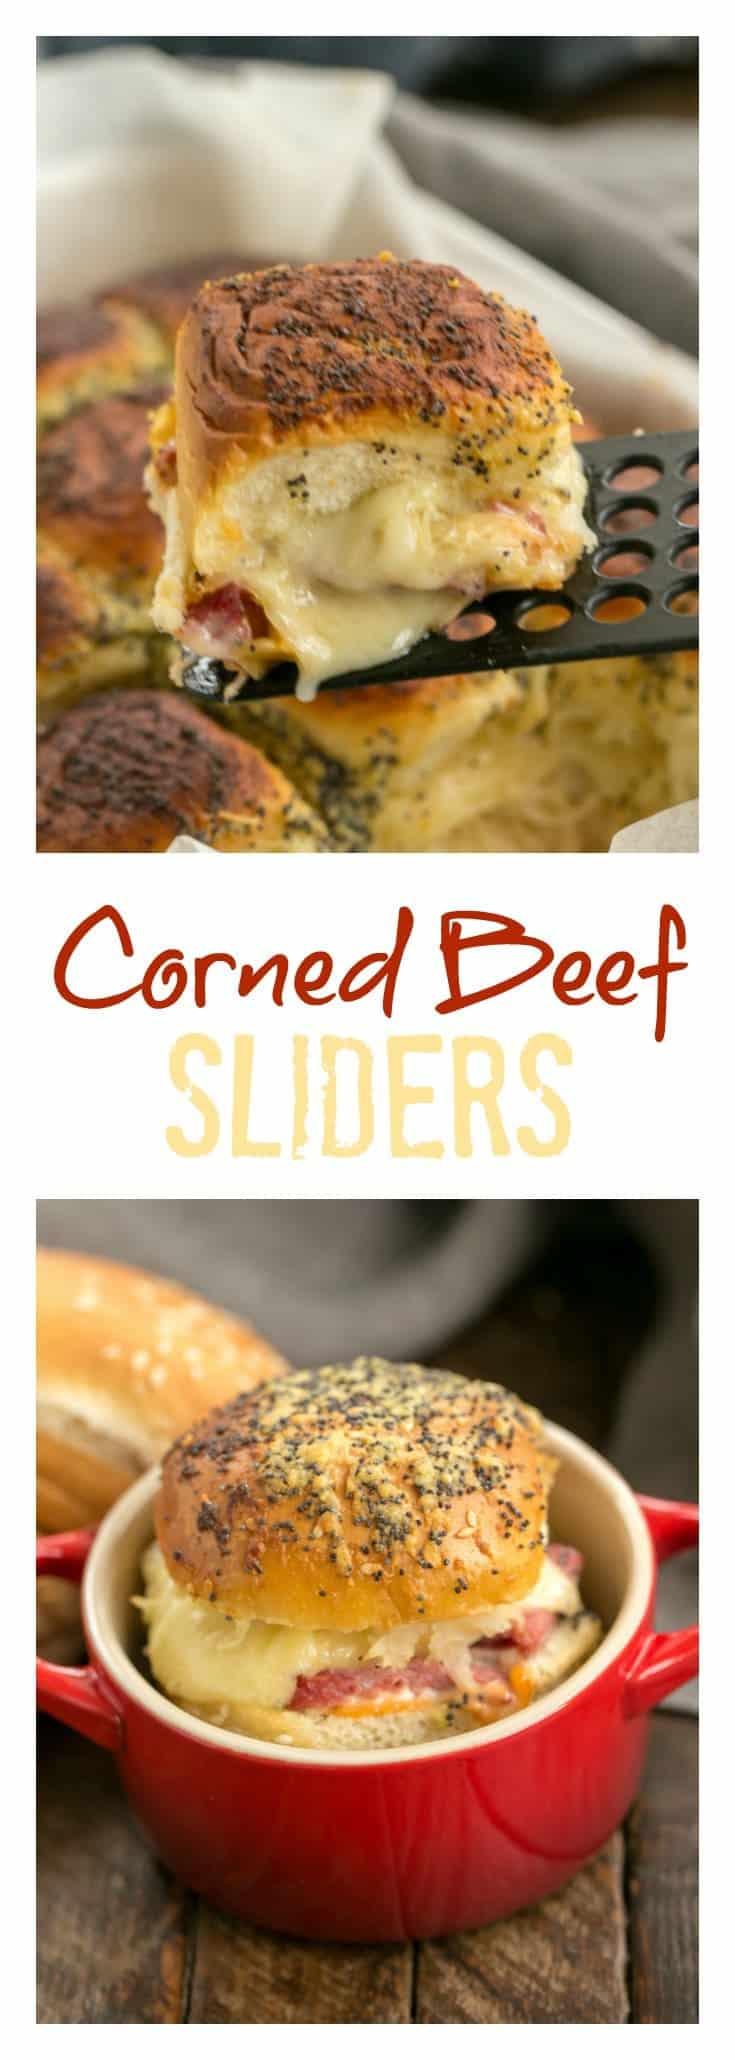 Corned Beef Sliders | All the fabulous flavors of a Reuben Sandwich in a slider! #cornedbeef #sandwich #sliders #Reuben #StPatricksDay